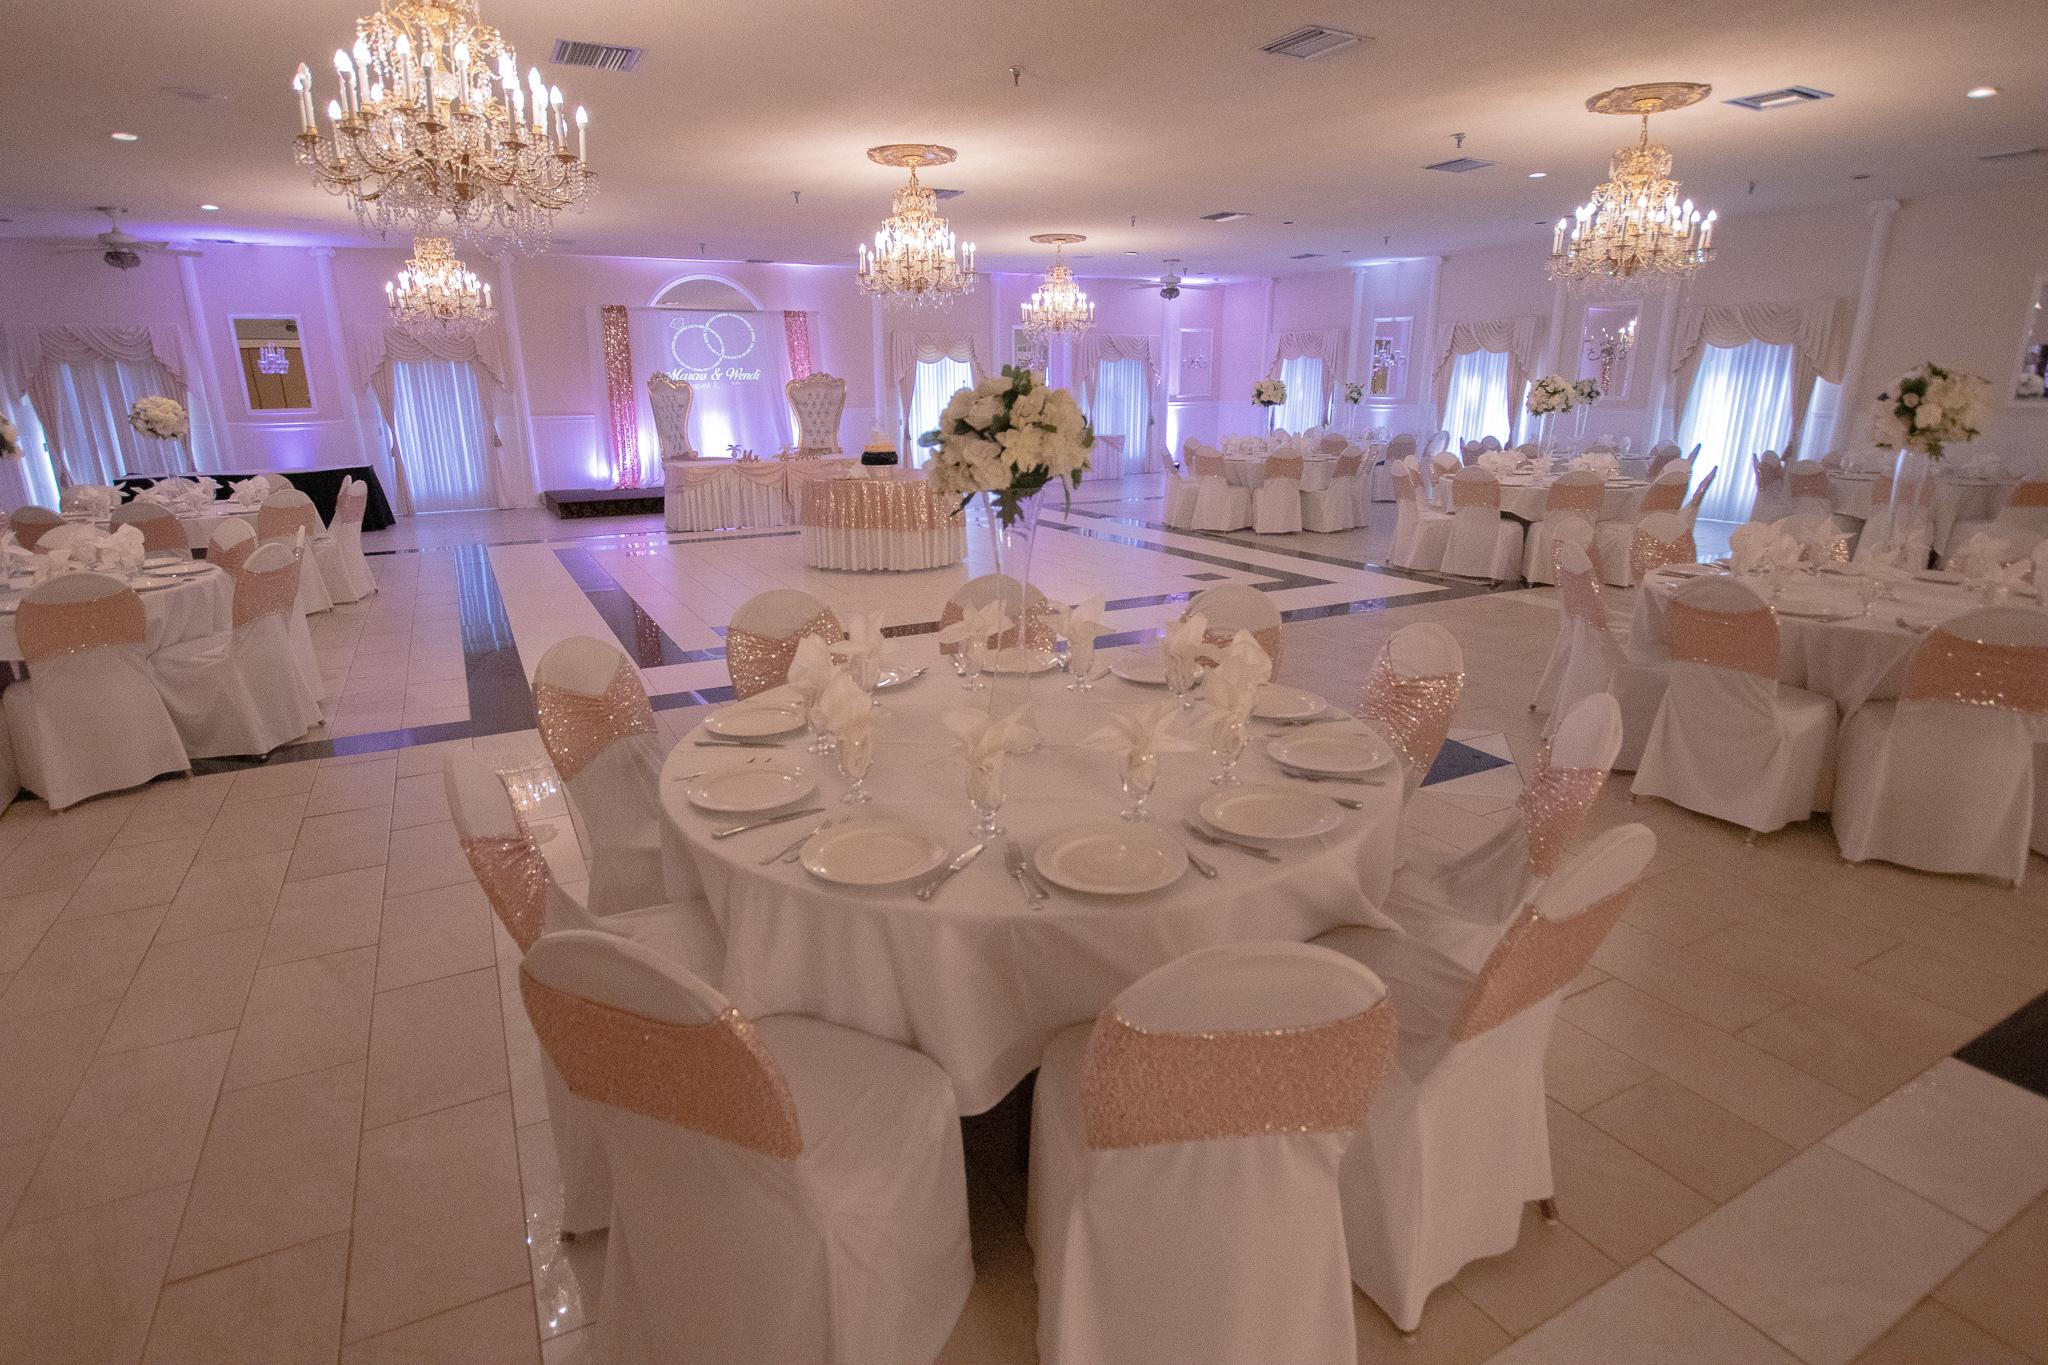 Dream Palace Banquet Hall Wedding Venue Receptions